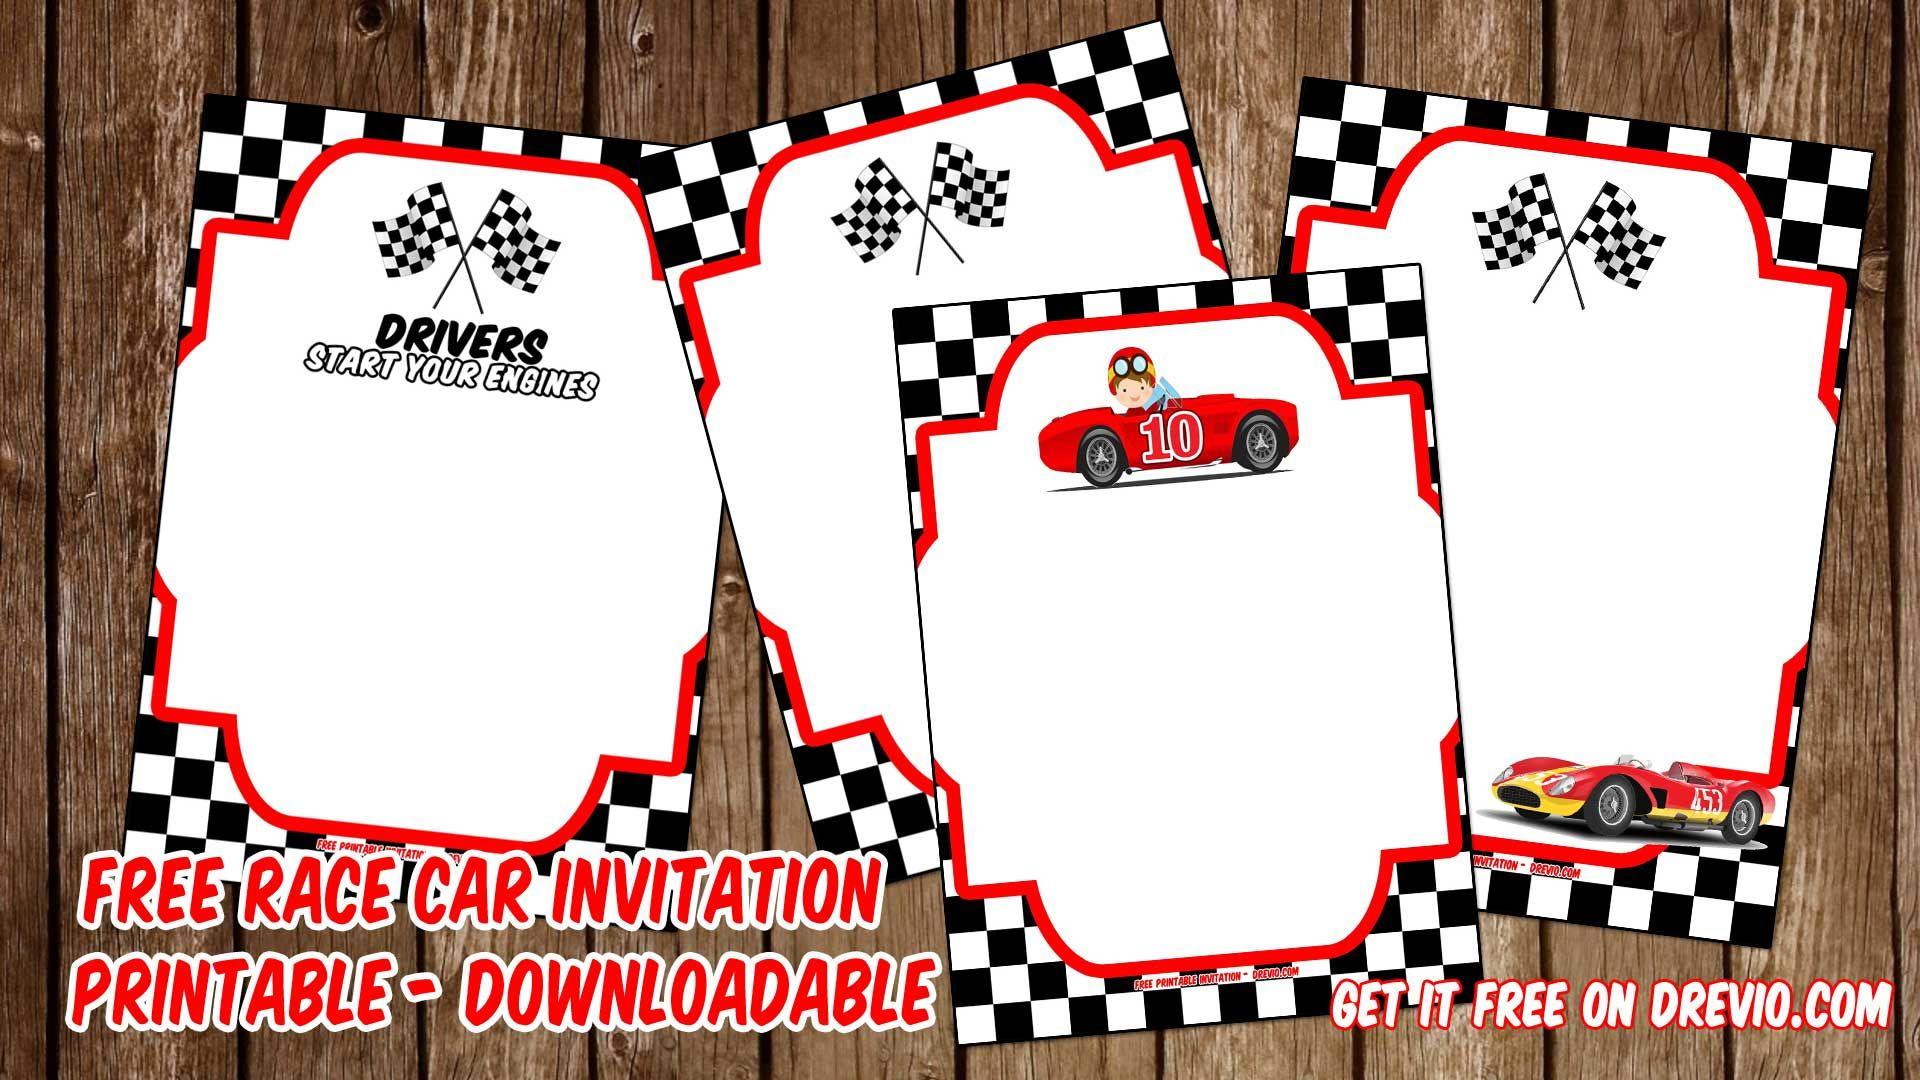 Free Printable Race Car Invitation Templates For John | Invitation - Free Printable Car Template